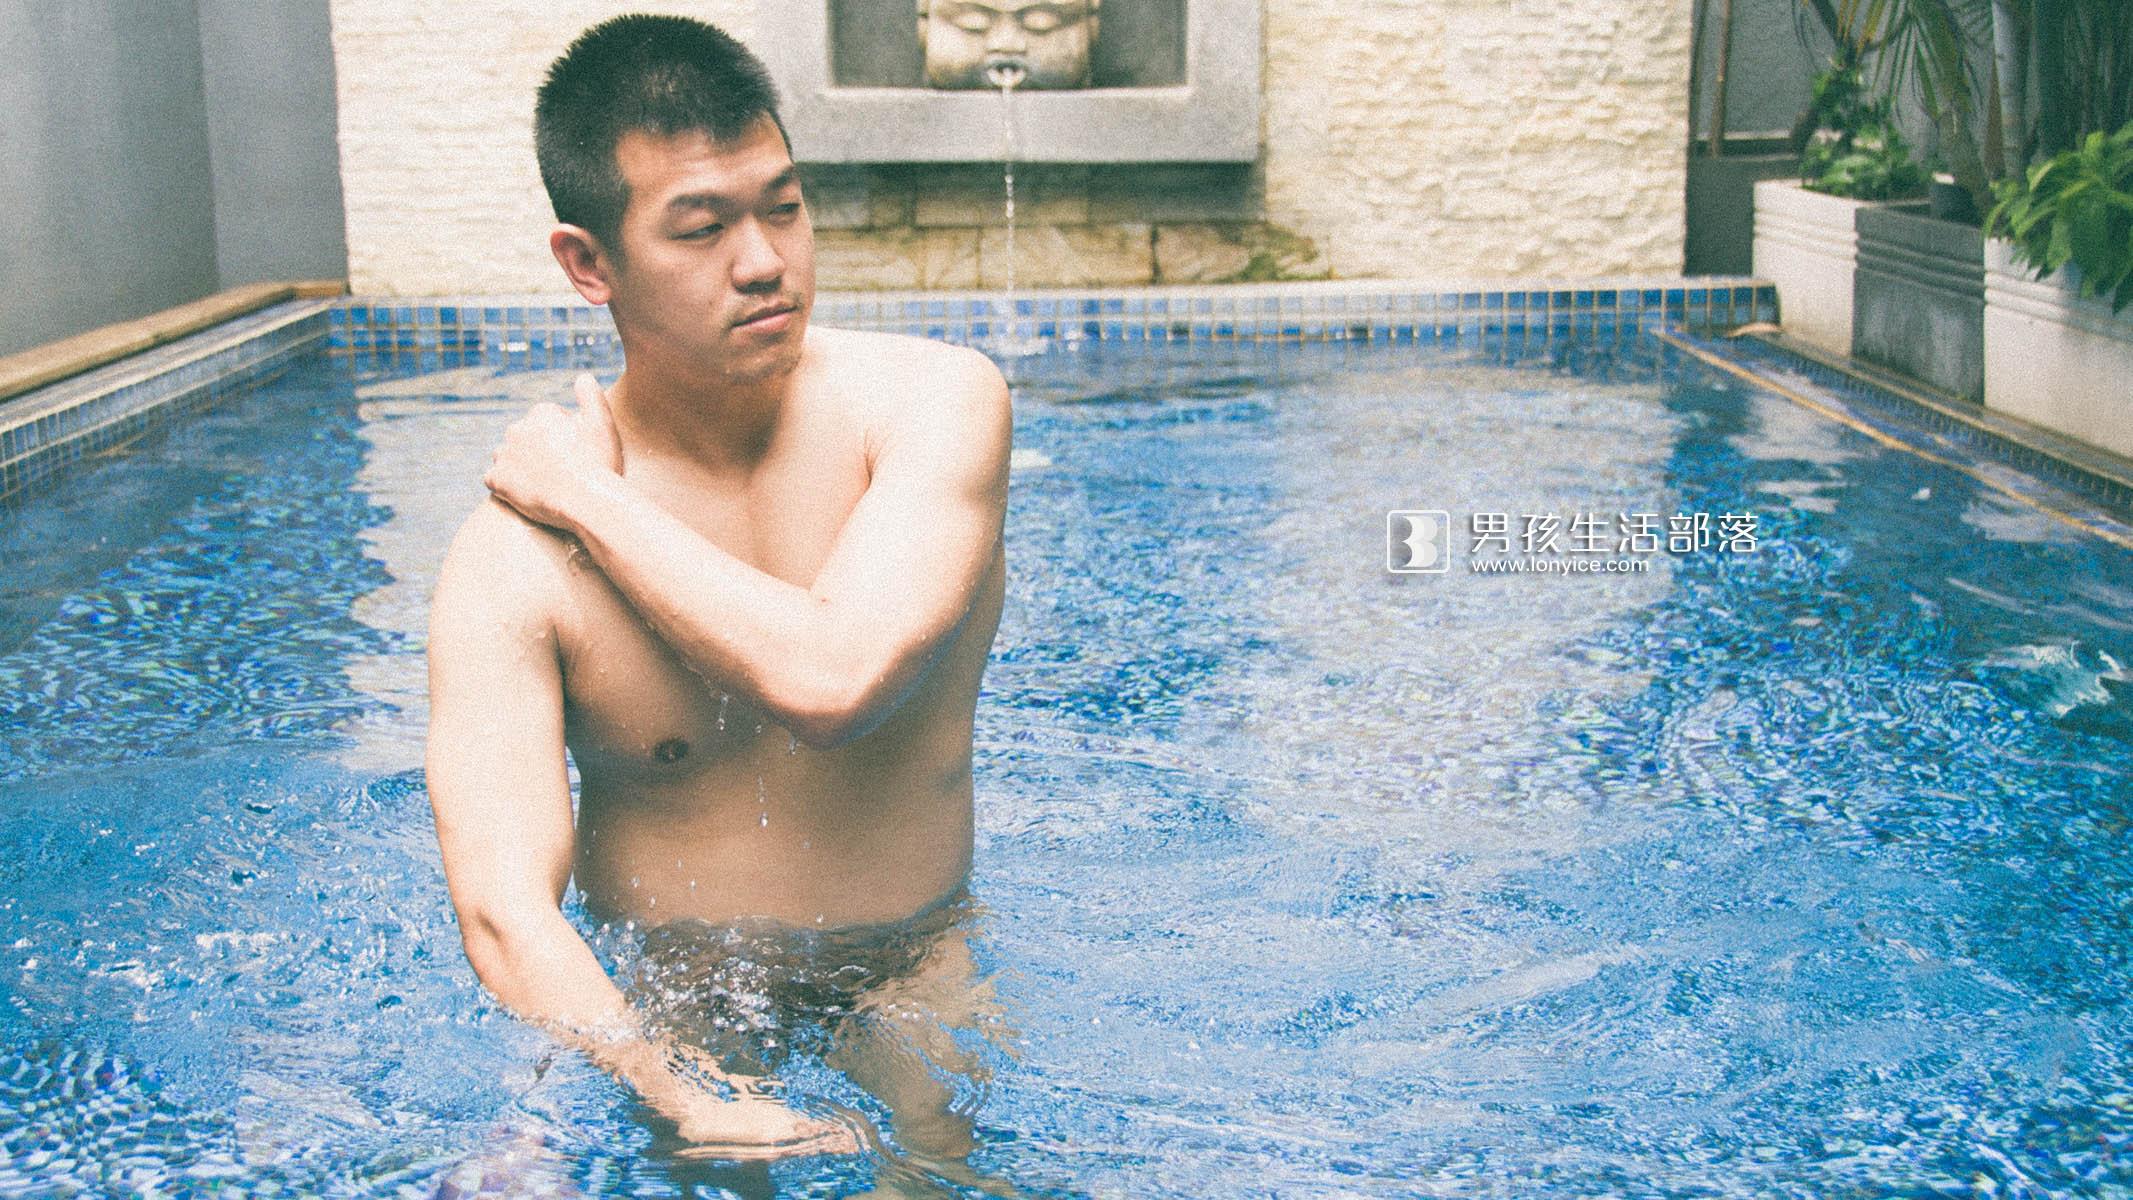 Poolside man #20